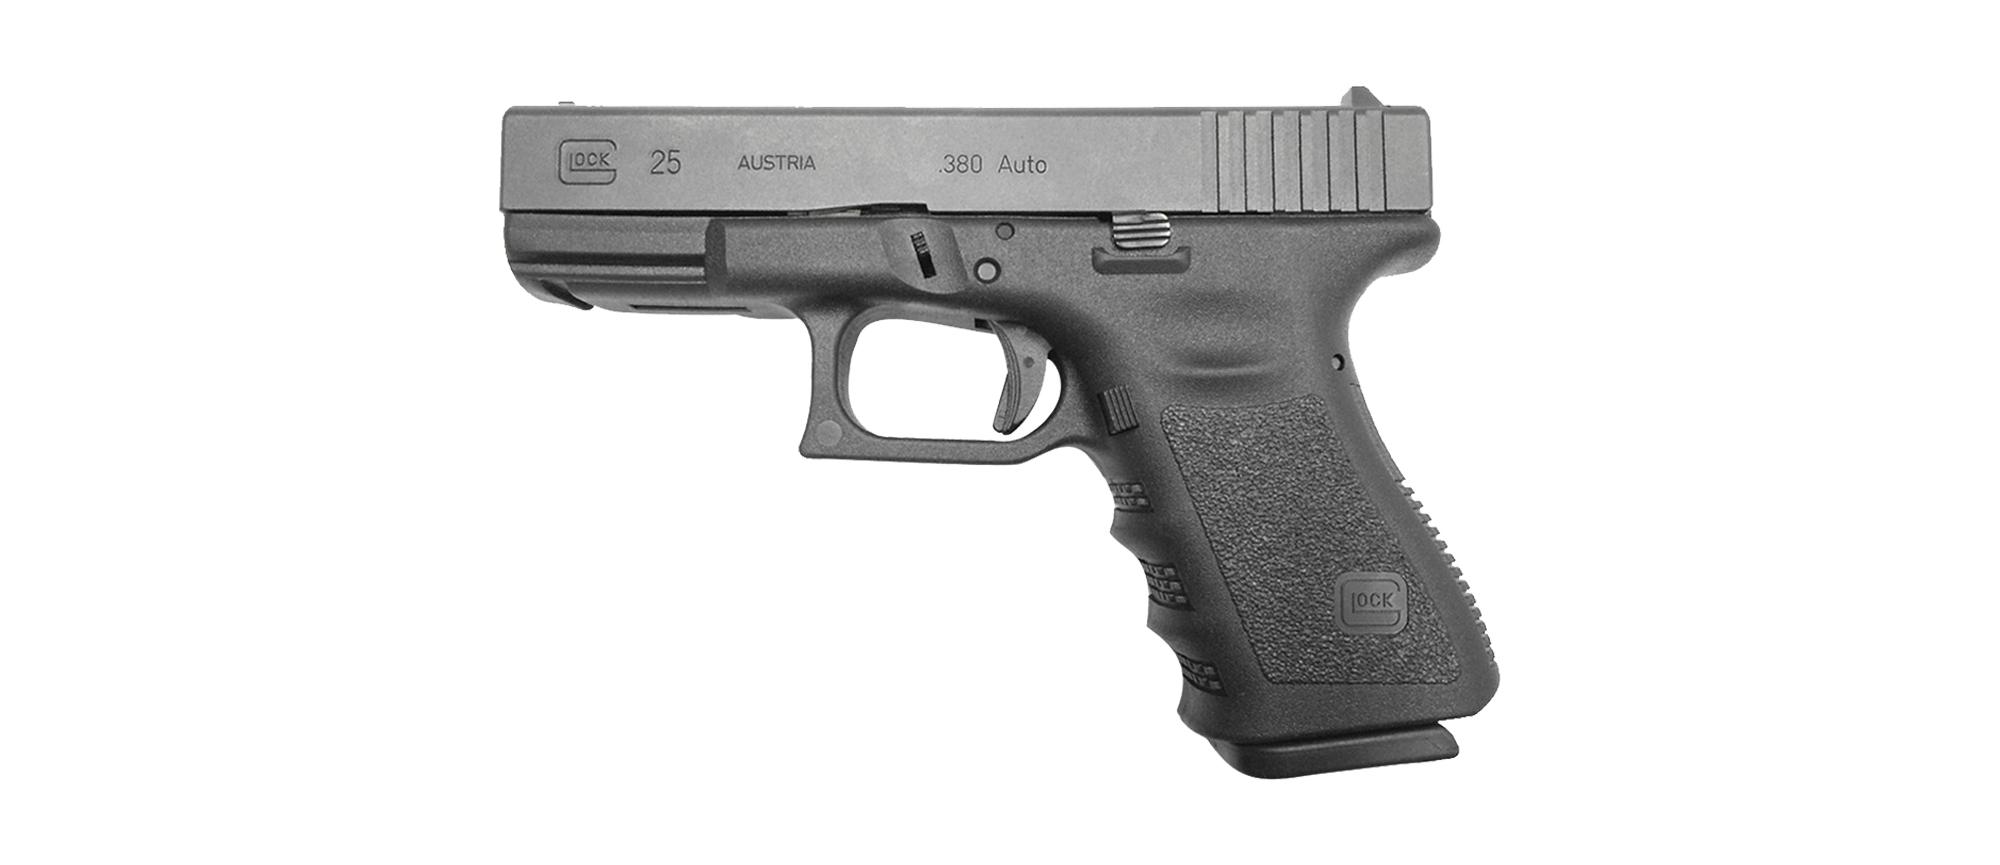 Glock 17 Schematic Diagram